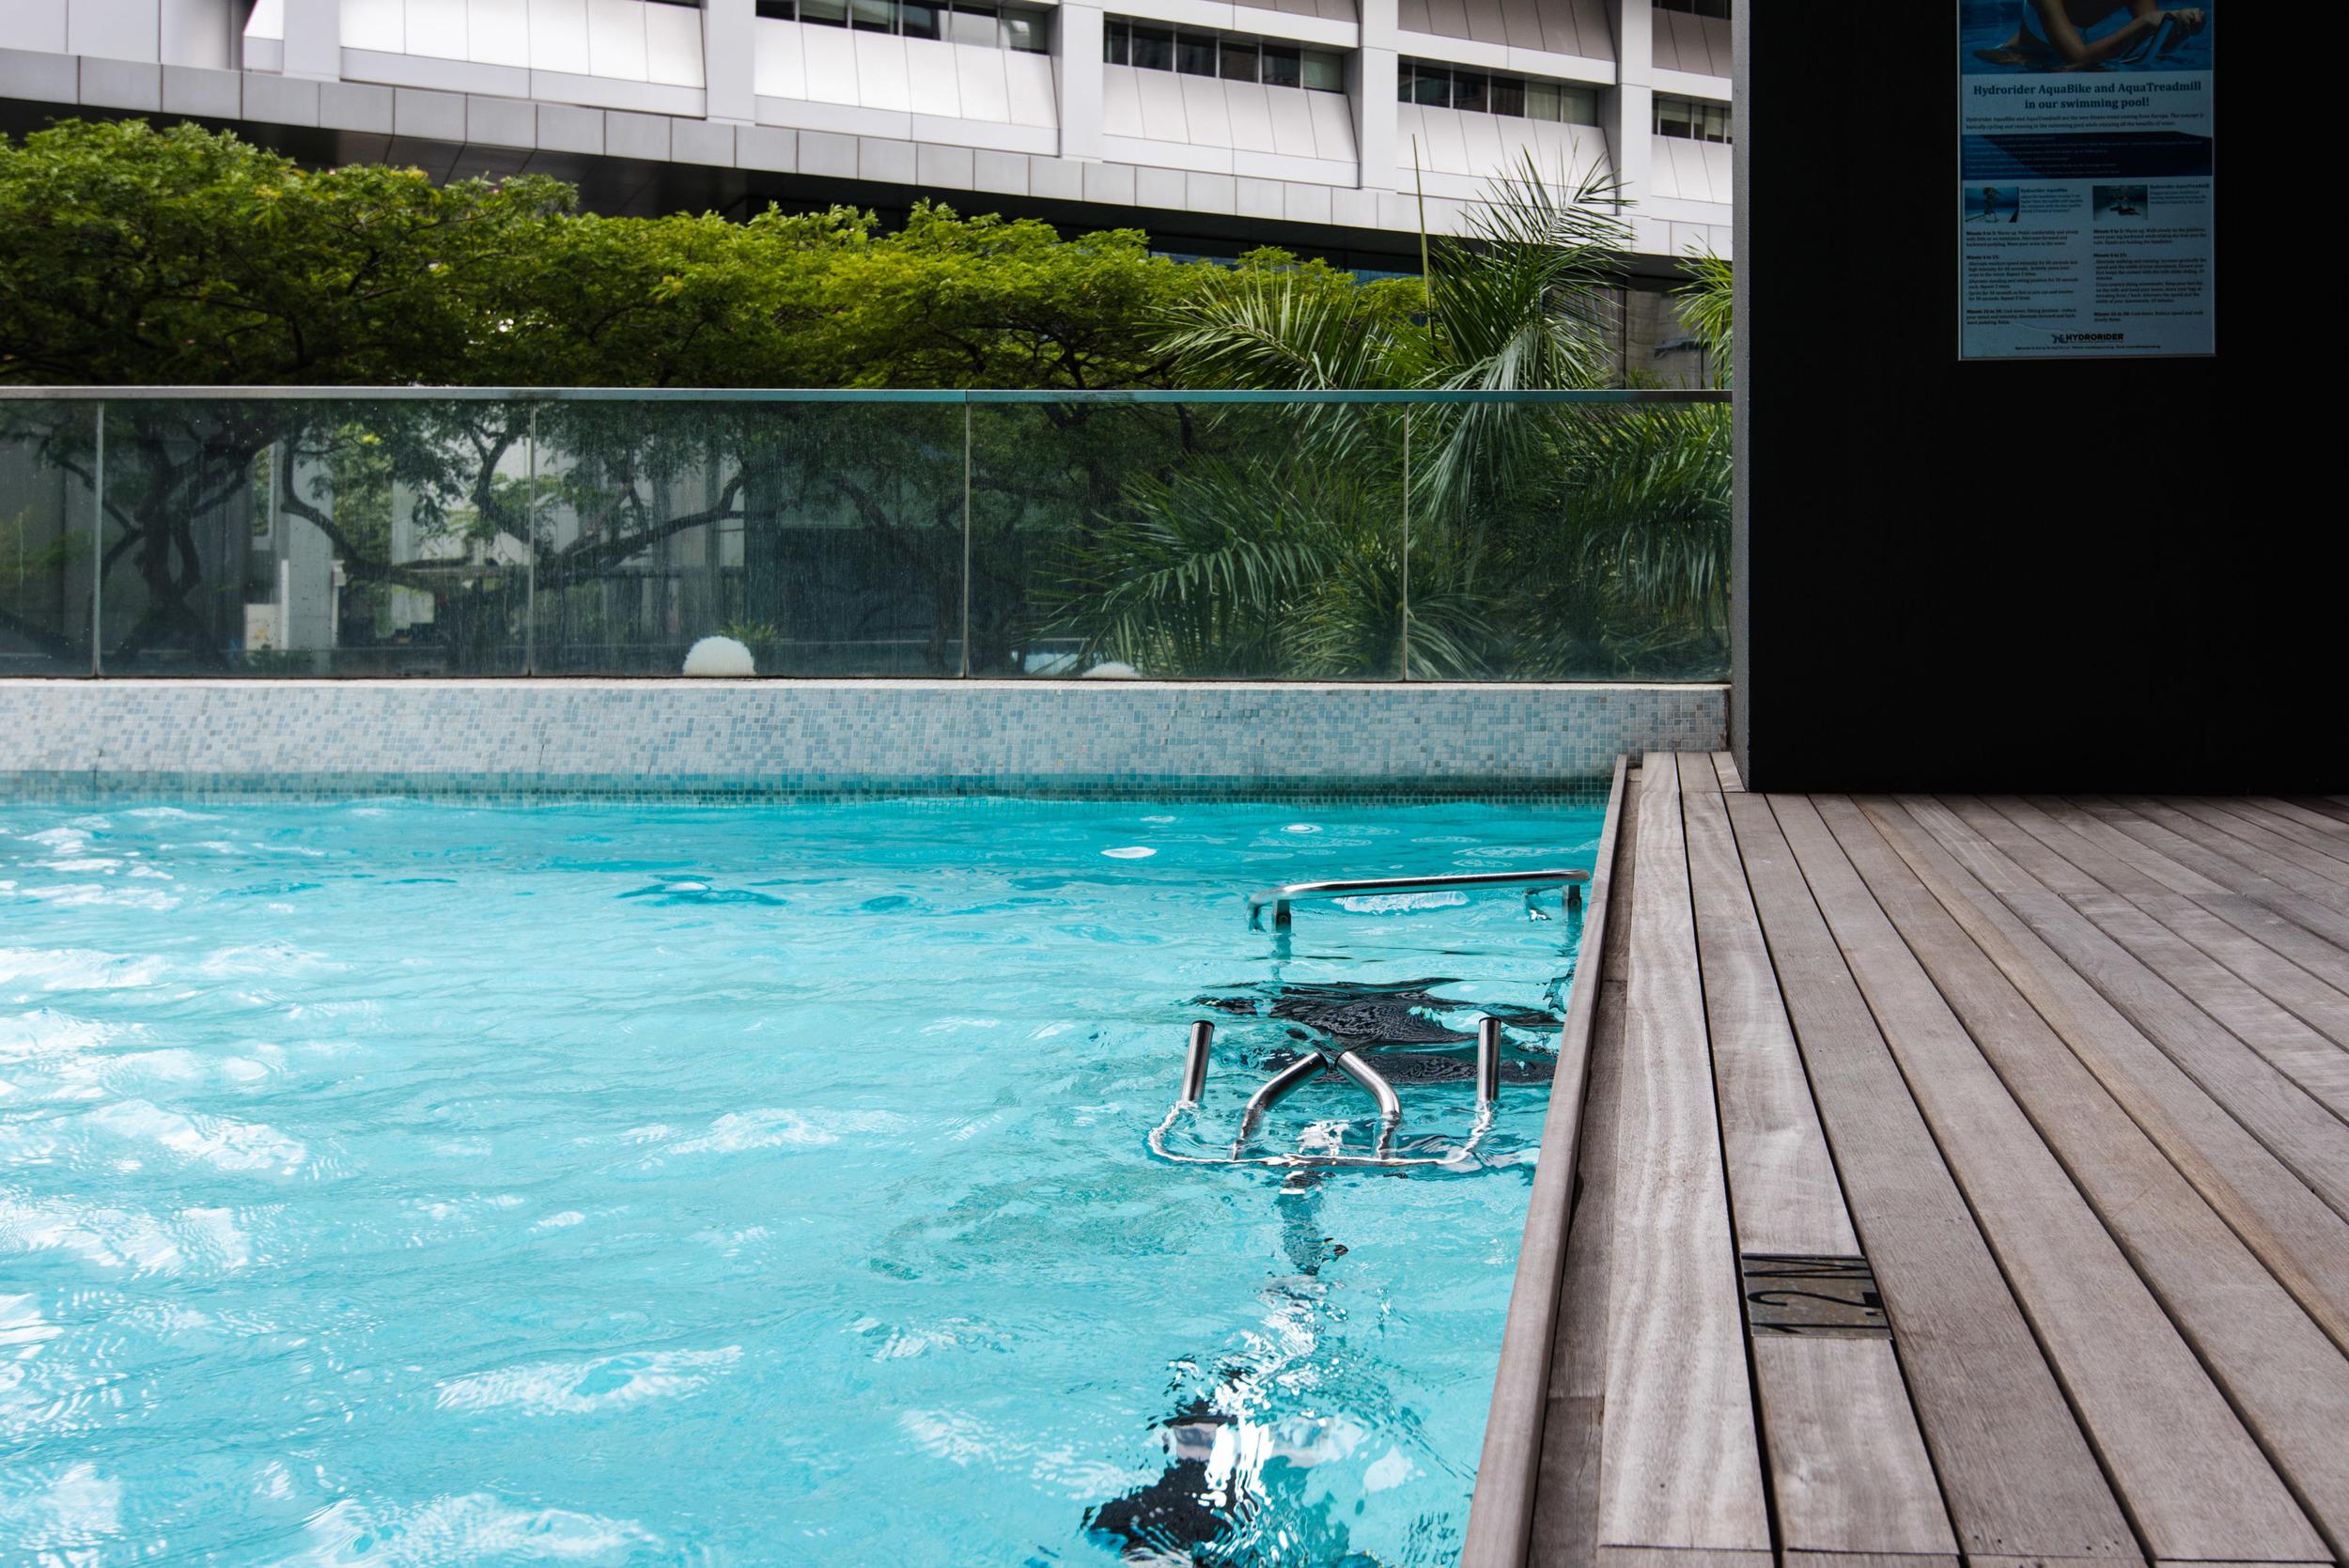 Hydro-Rider Aqua Fitness Equipment